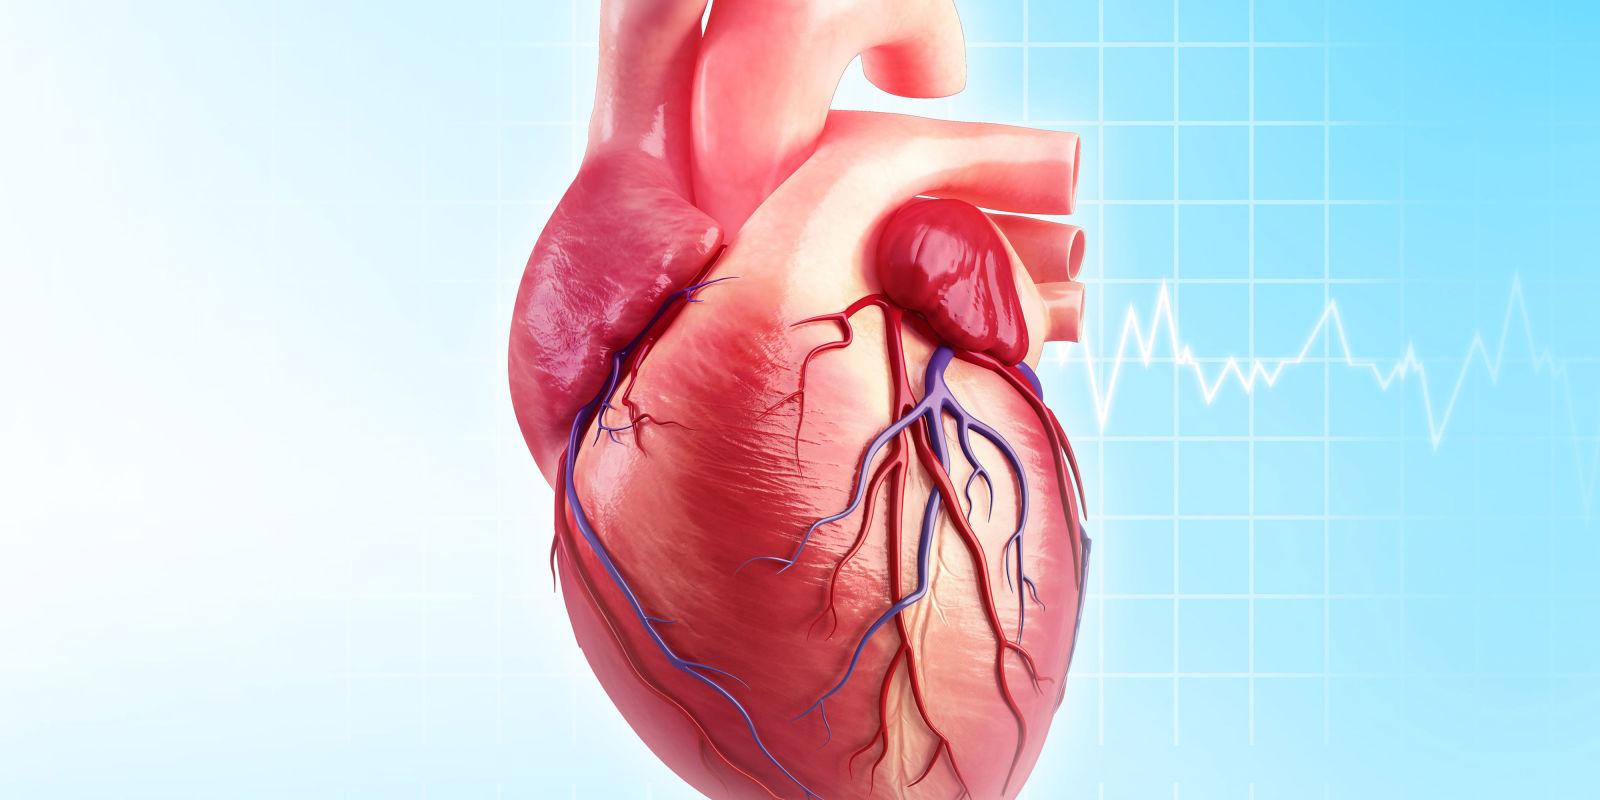 Structure of the mammalian heart